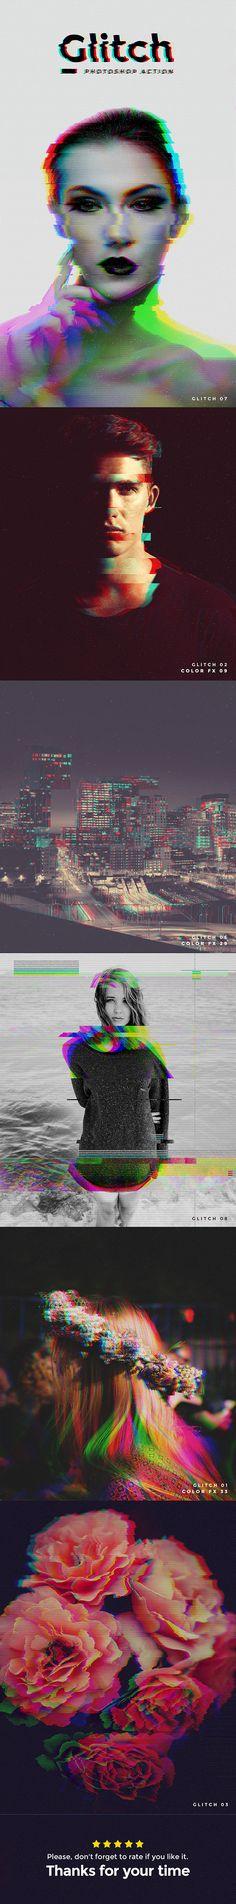 Glitch Photoshop Action: Photo Effects Photoshop created by Actions Photoshop, Photoshop Effects, Photoshop Tutorial, Photography Editing, Photography Tutorials, Art Photography, Photo Editing, Popular Photography, Photomontage